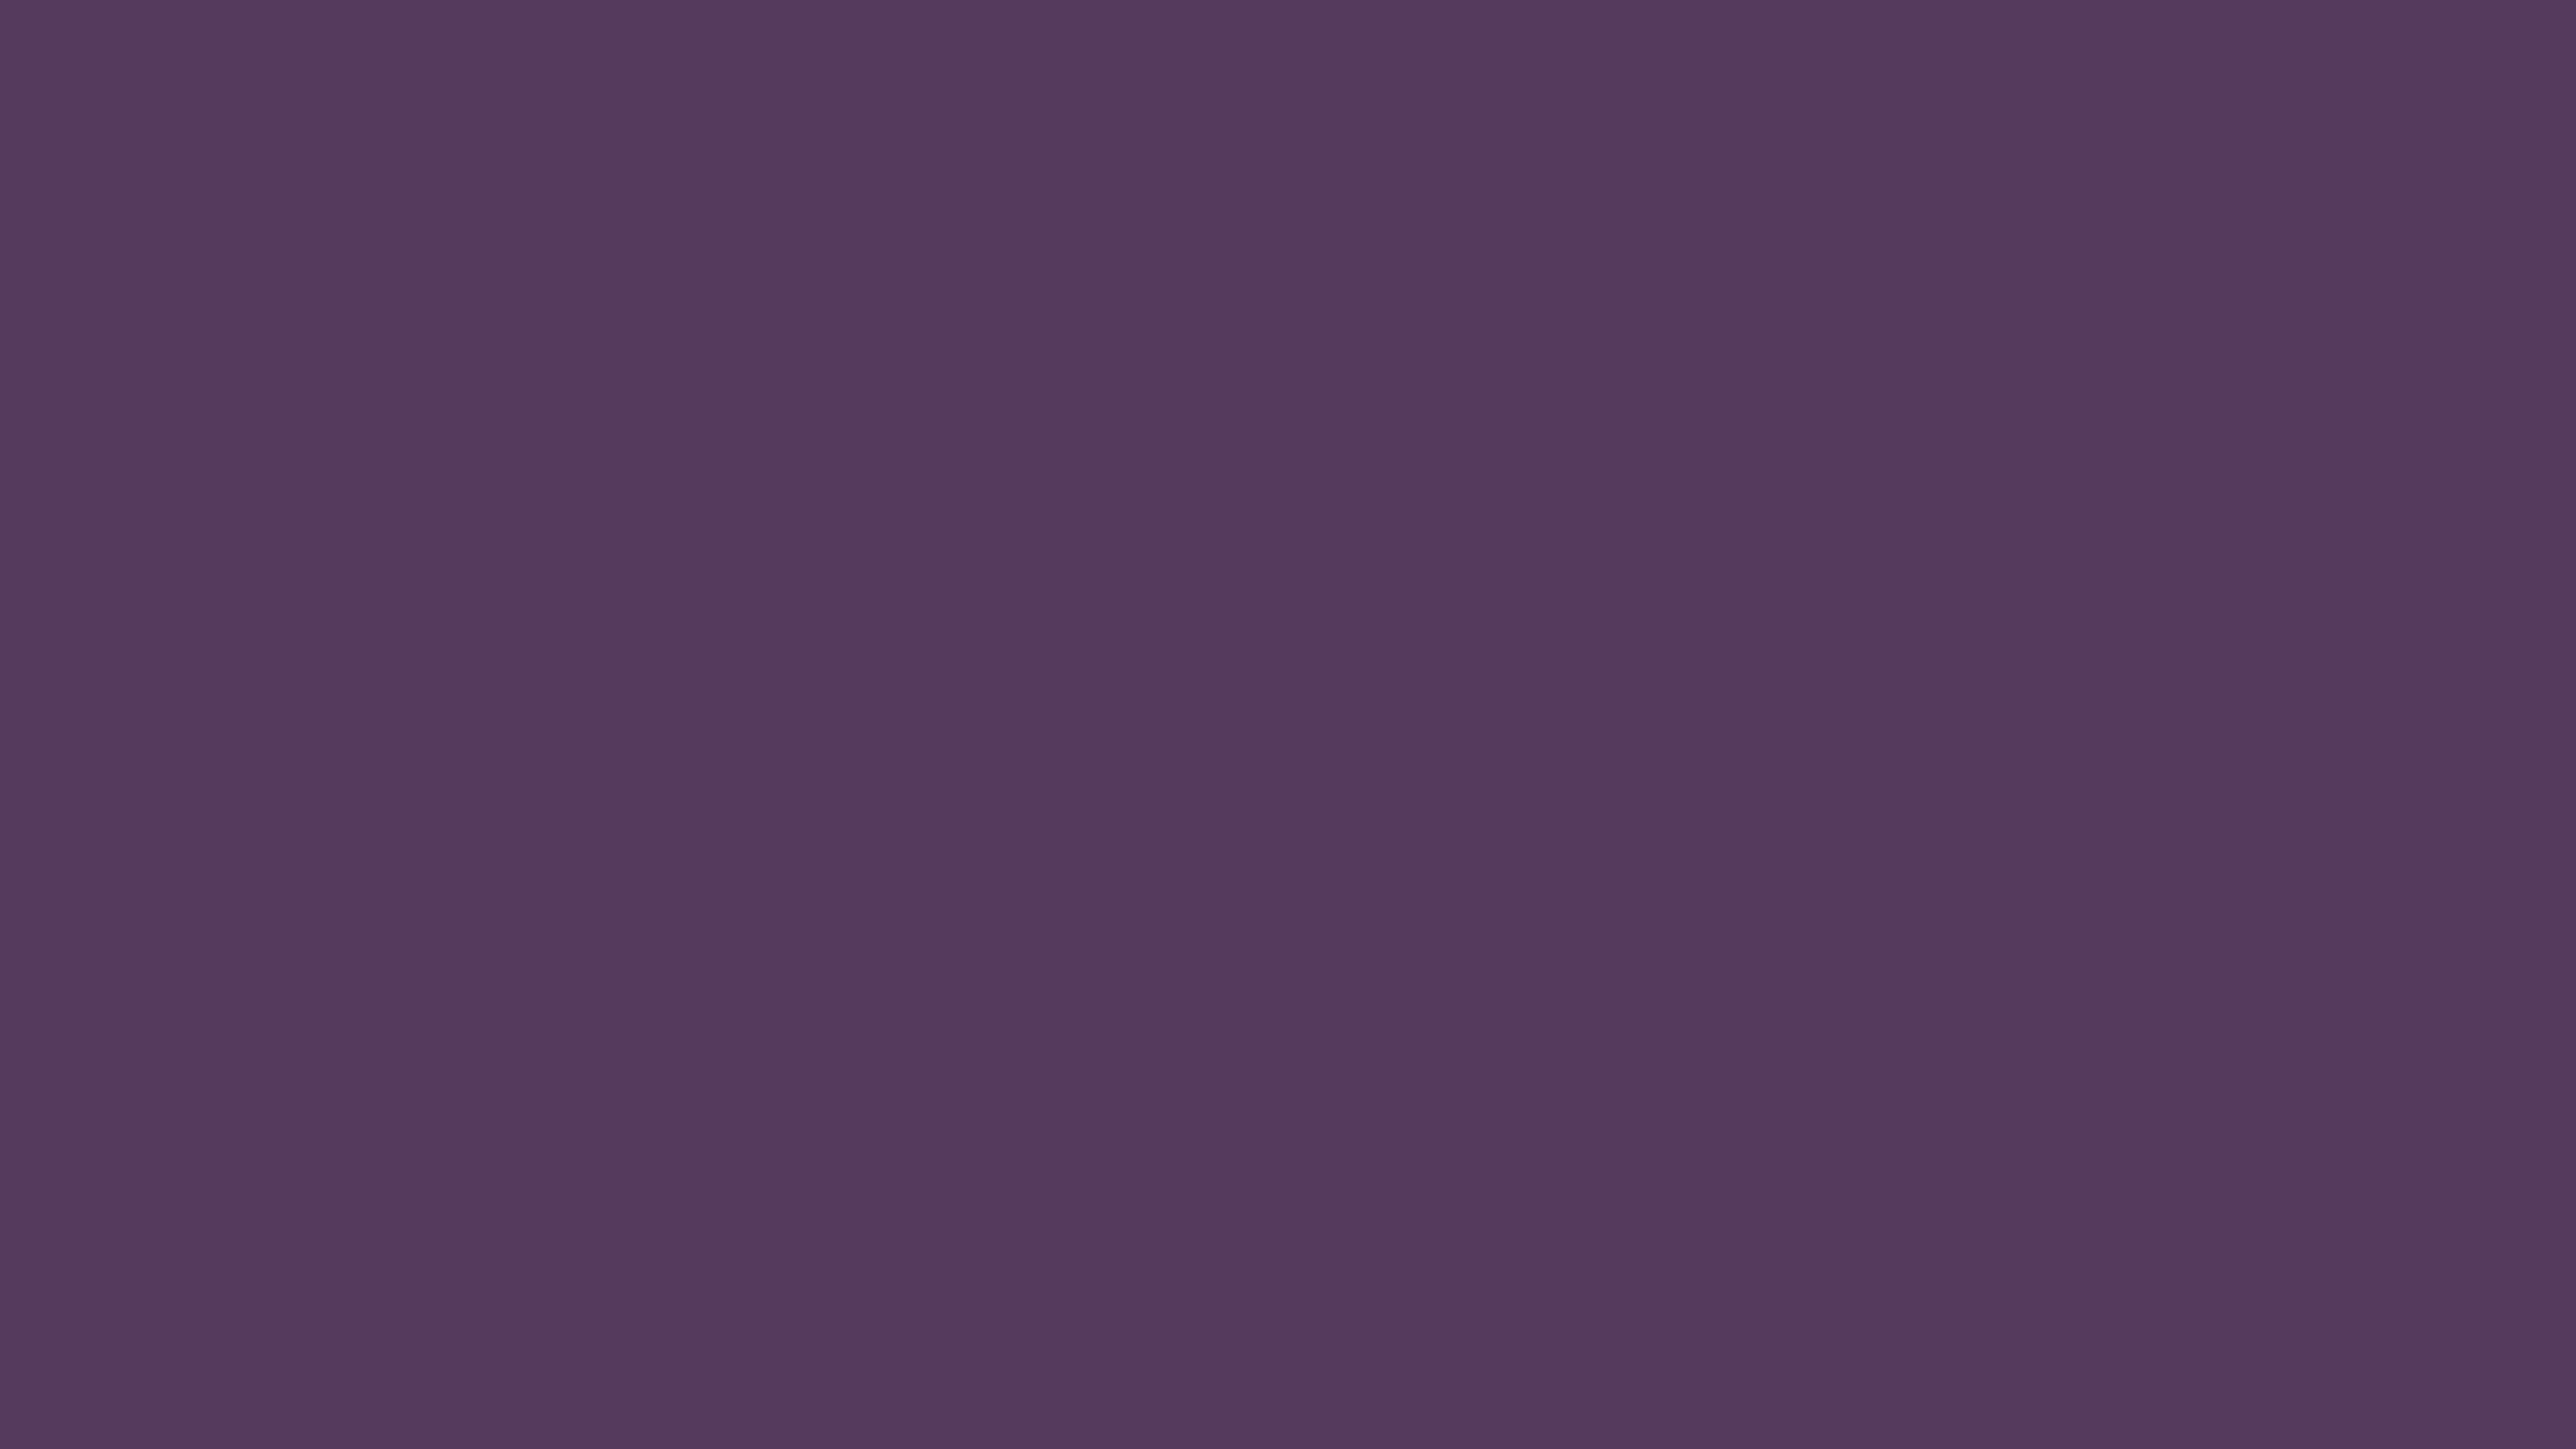 7680x4320 English Violet Solid Color Background